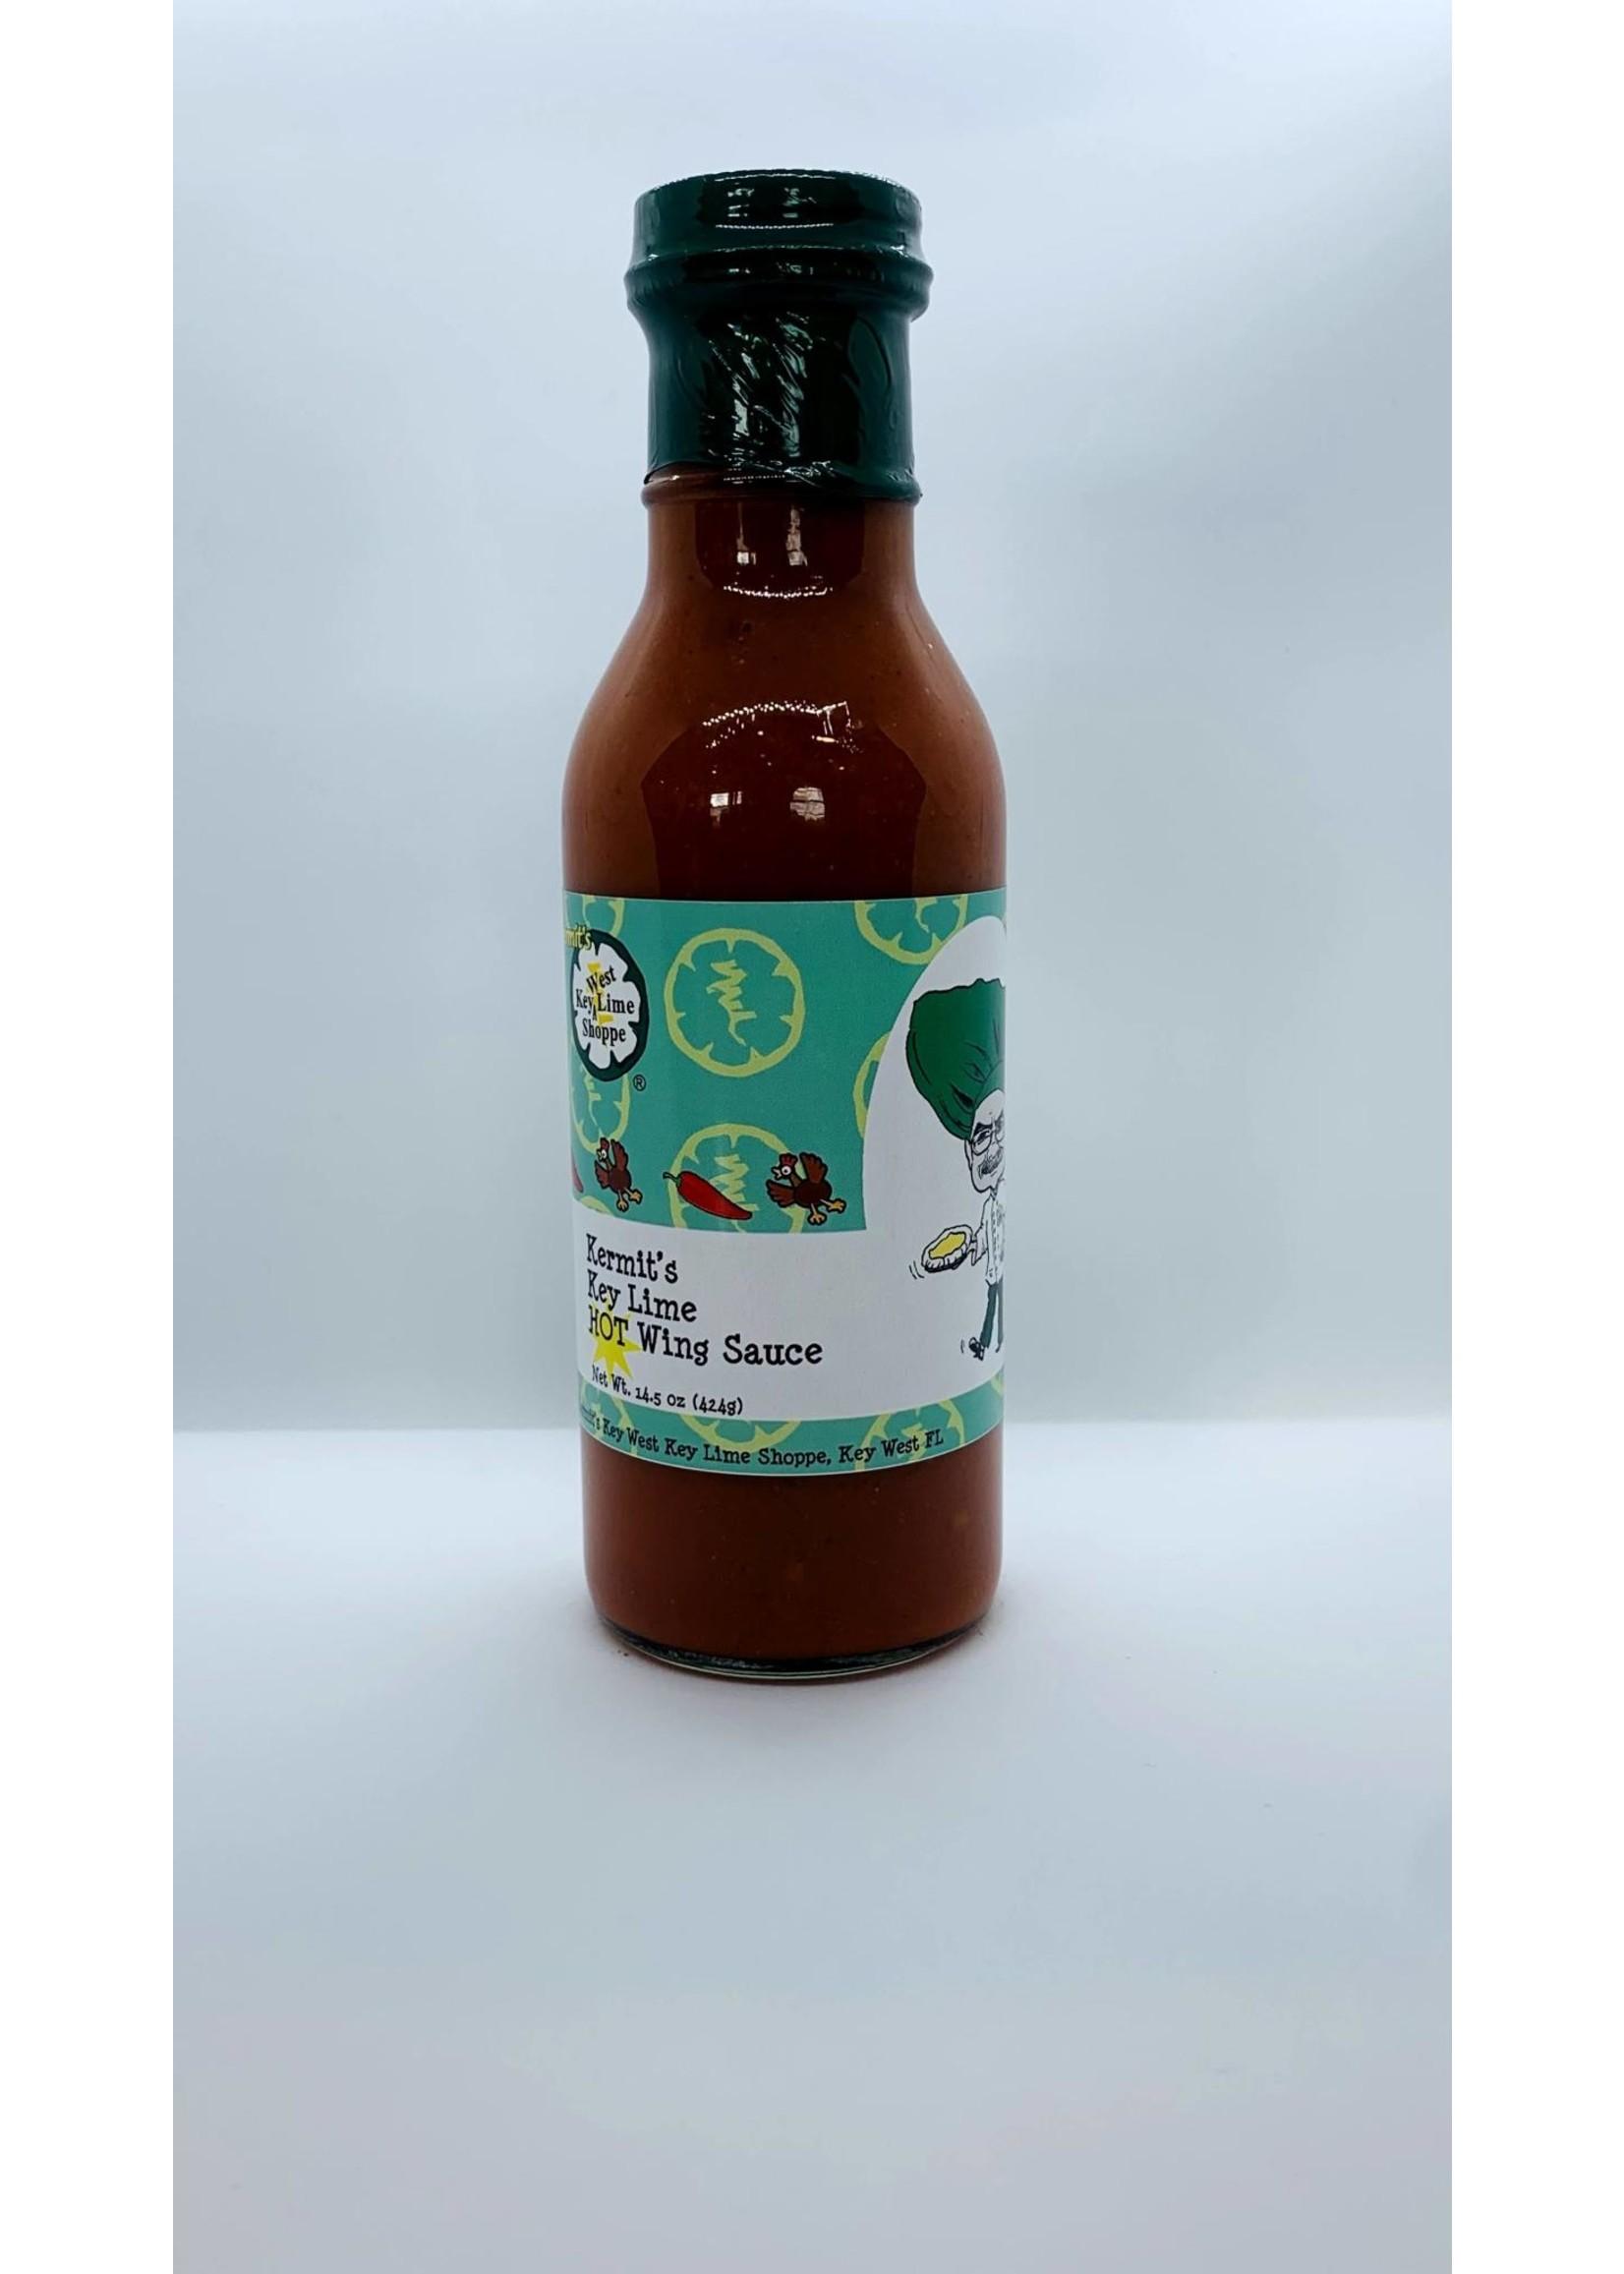 Kermit's Key Lime Hot Wing Sauce 14.5 oz